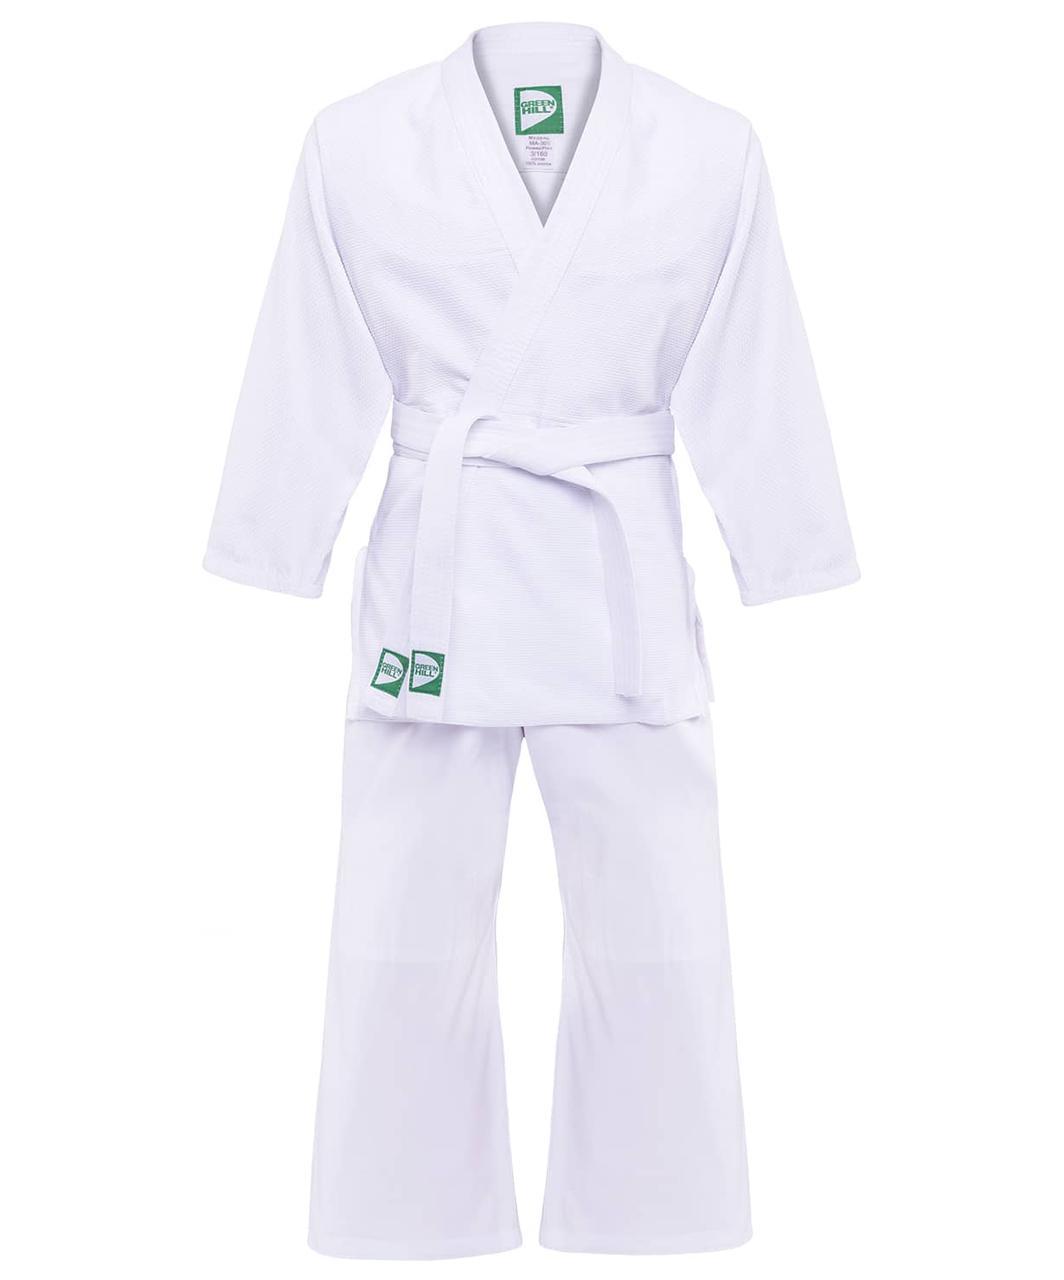 Кимоно для дзюдо MA-302 белый,  Green Hill